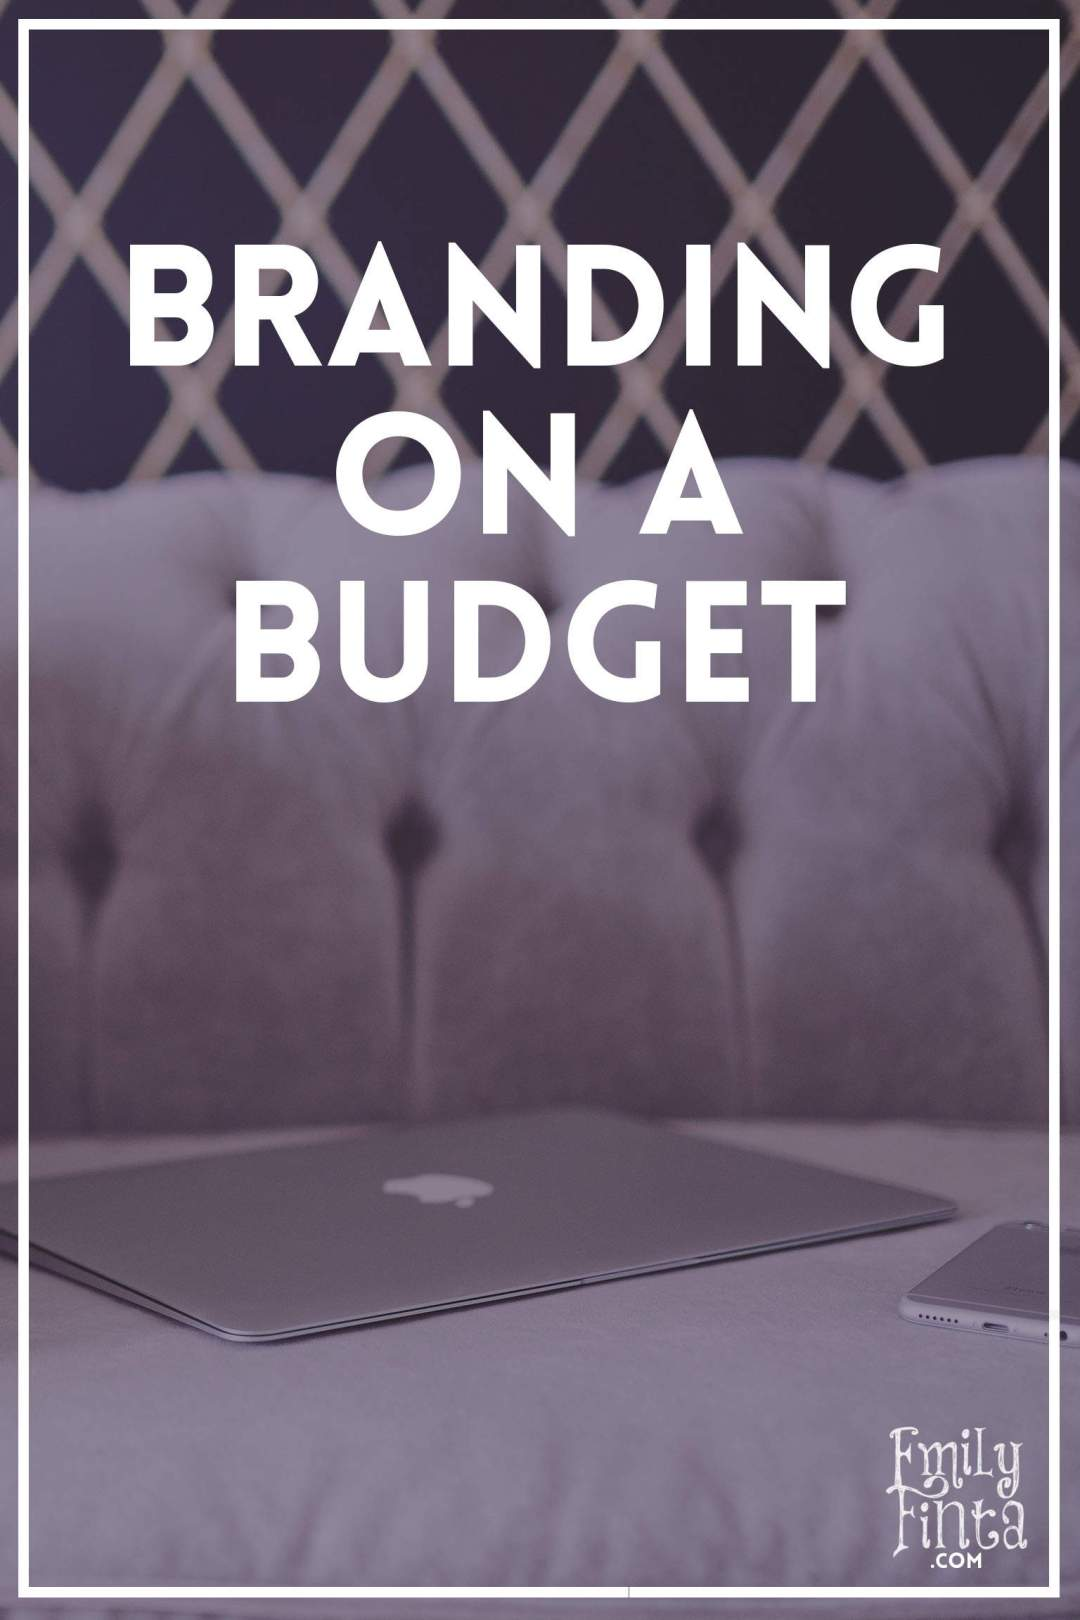 Emily Finta - Branding on a Budget